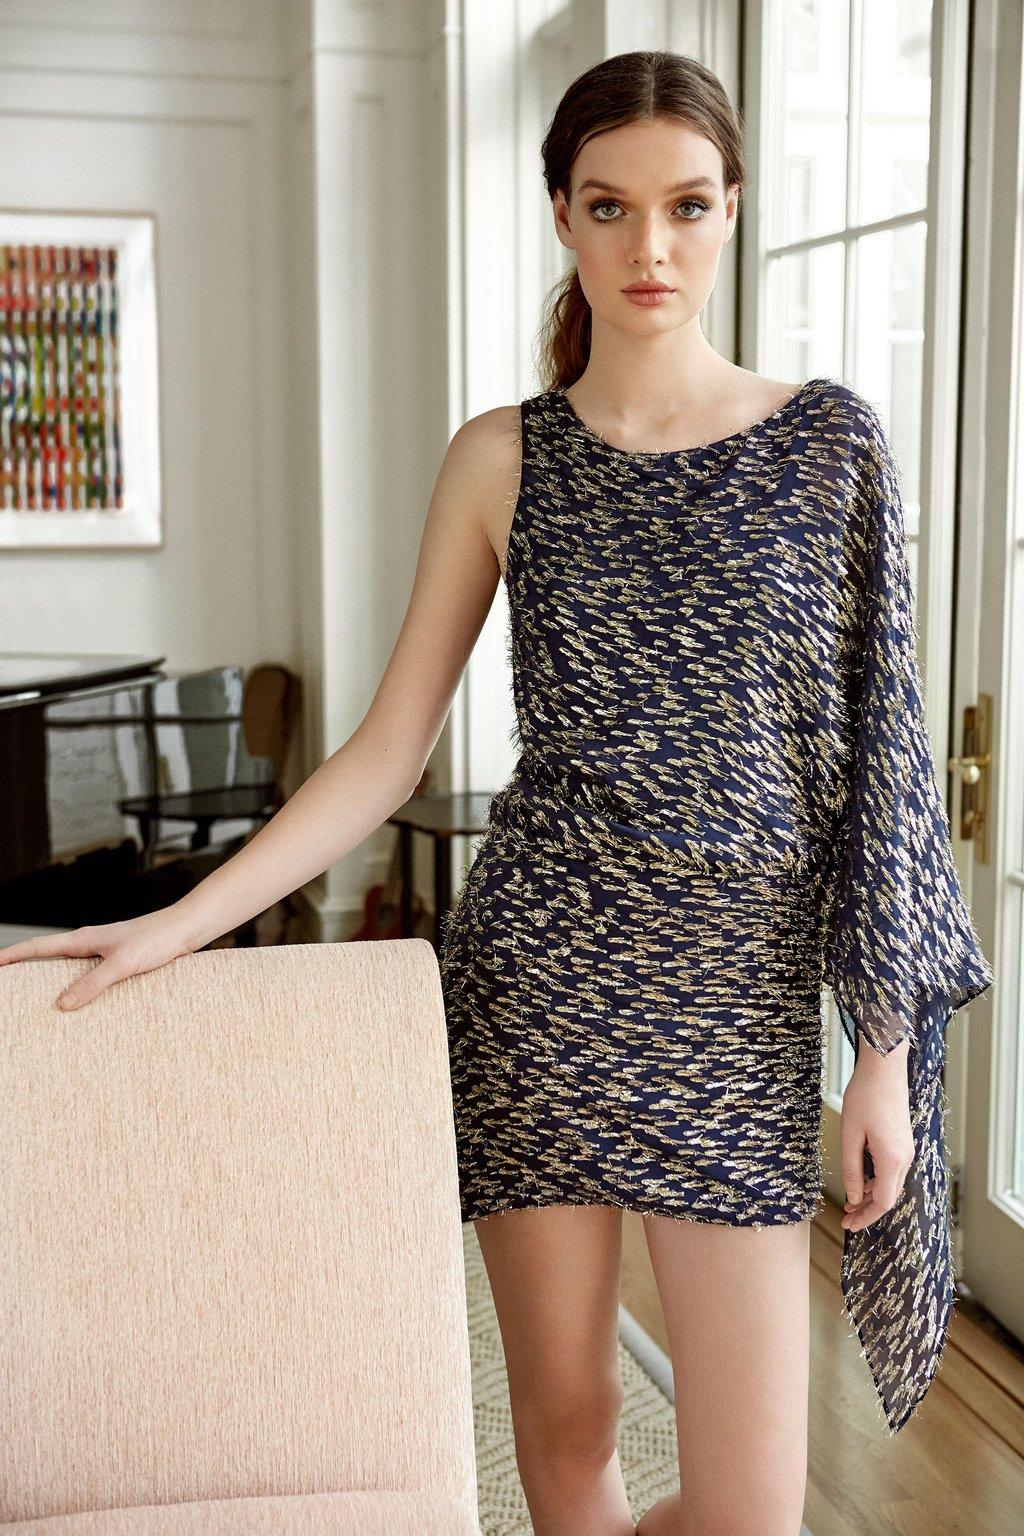 08_Lucia_draped_sleeve_dress_2364da71-252f-4768-9a2b-b8ec08ad9f67_1024x.jpg